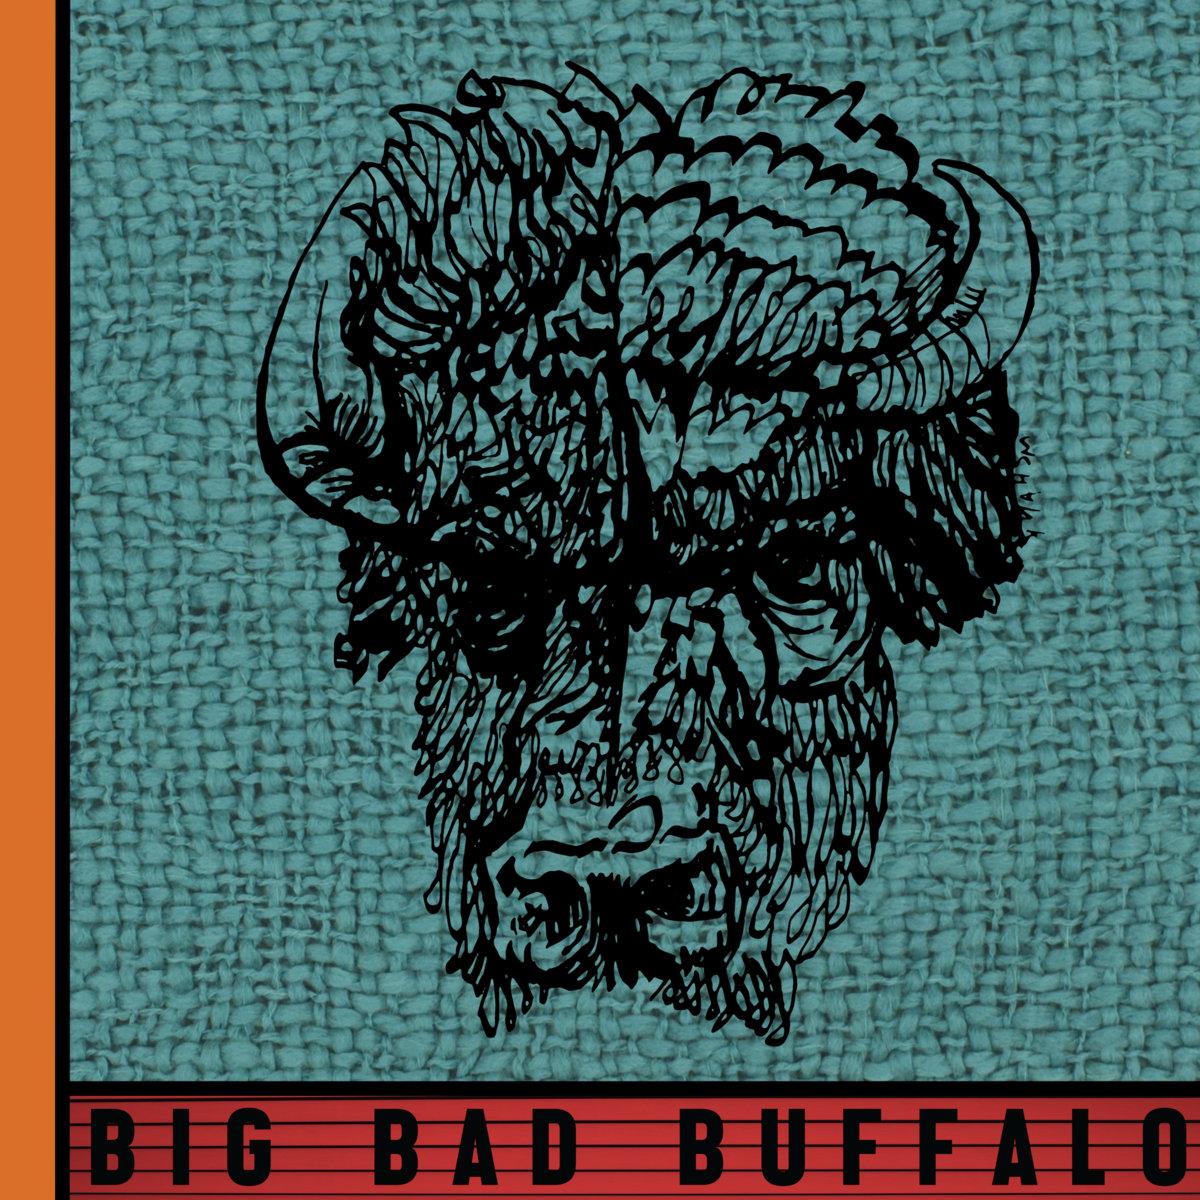 Terrible texter big bad buffalo terrible texter malvernweather Gallery